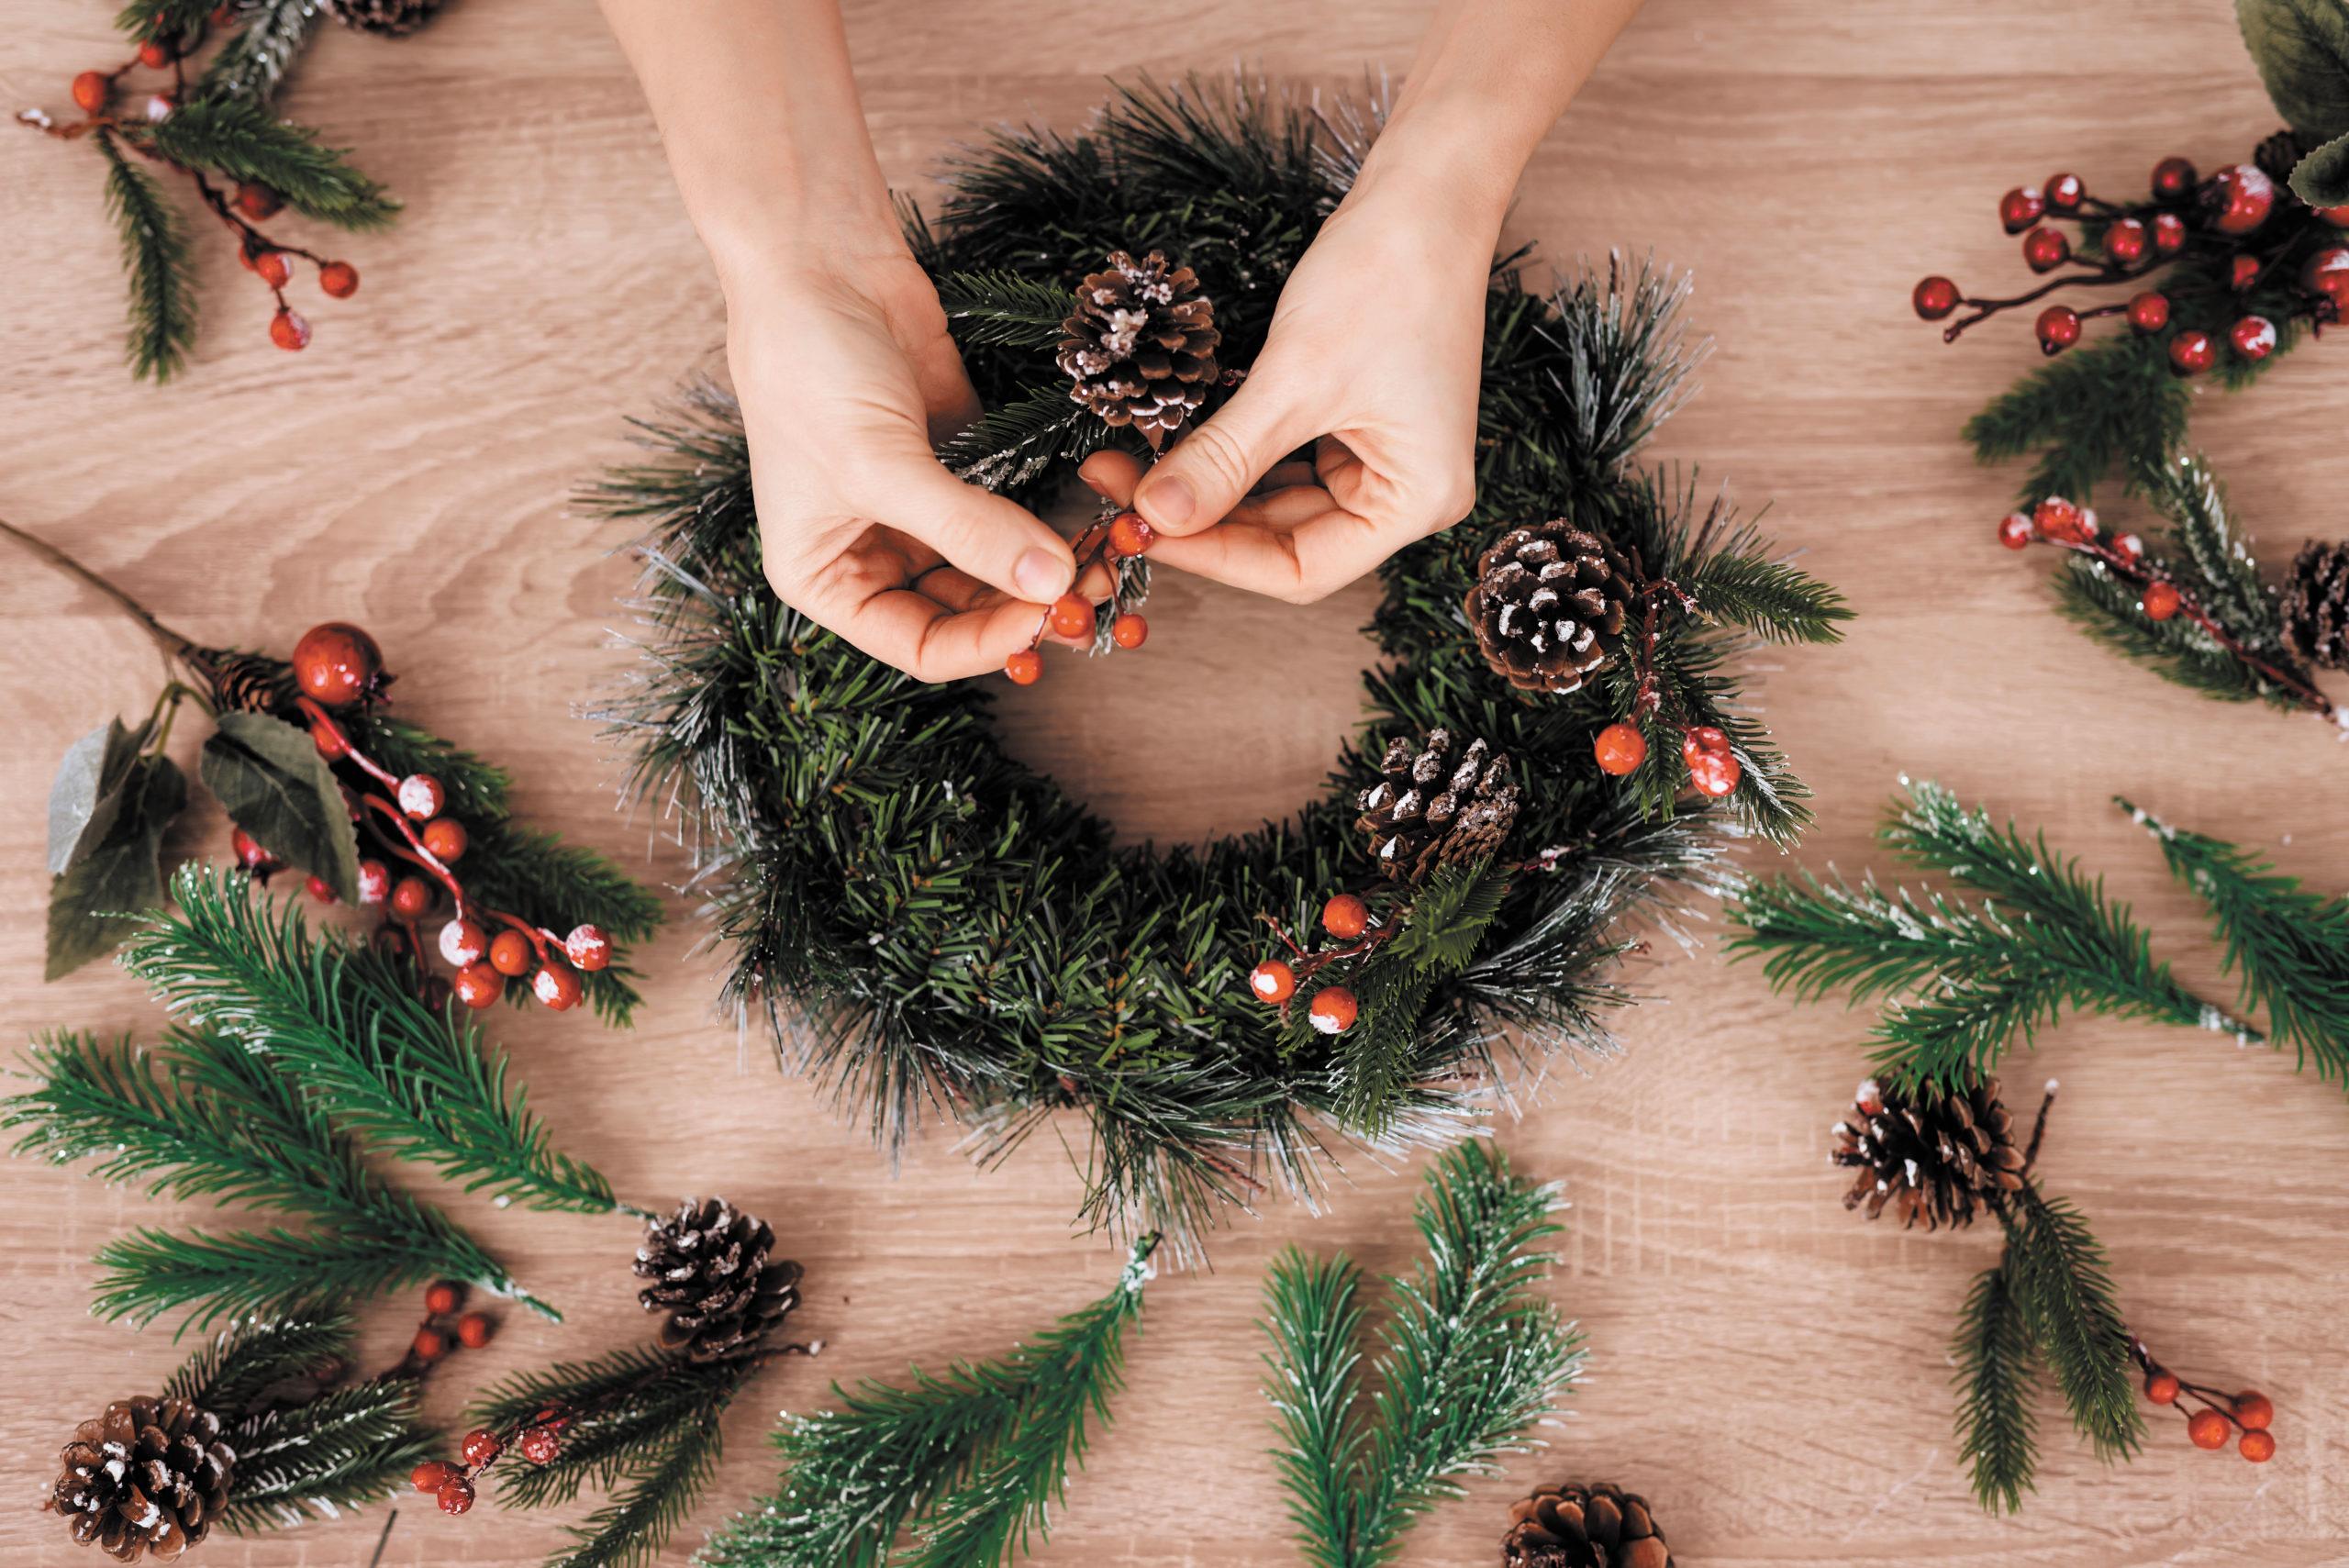 Woman Making Christmas Wreath for Xmas Holidays.